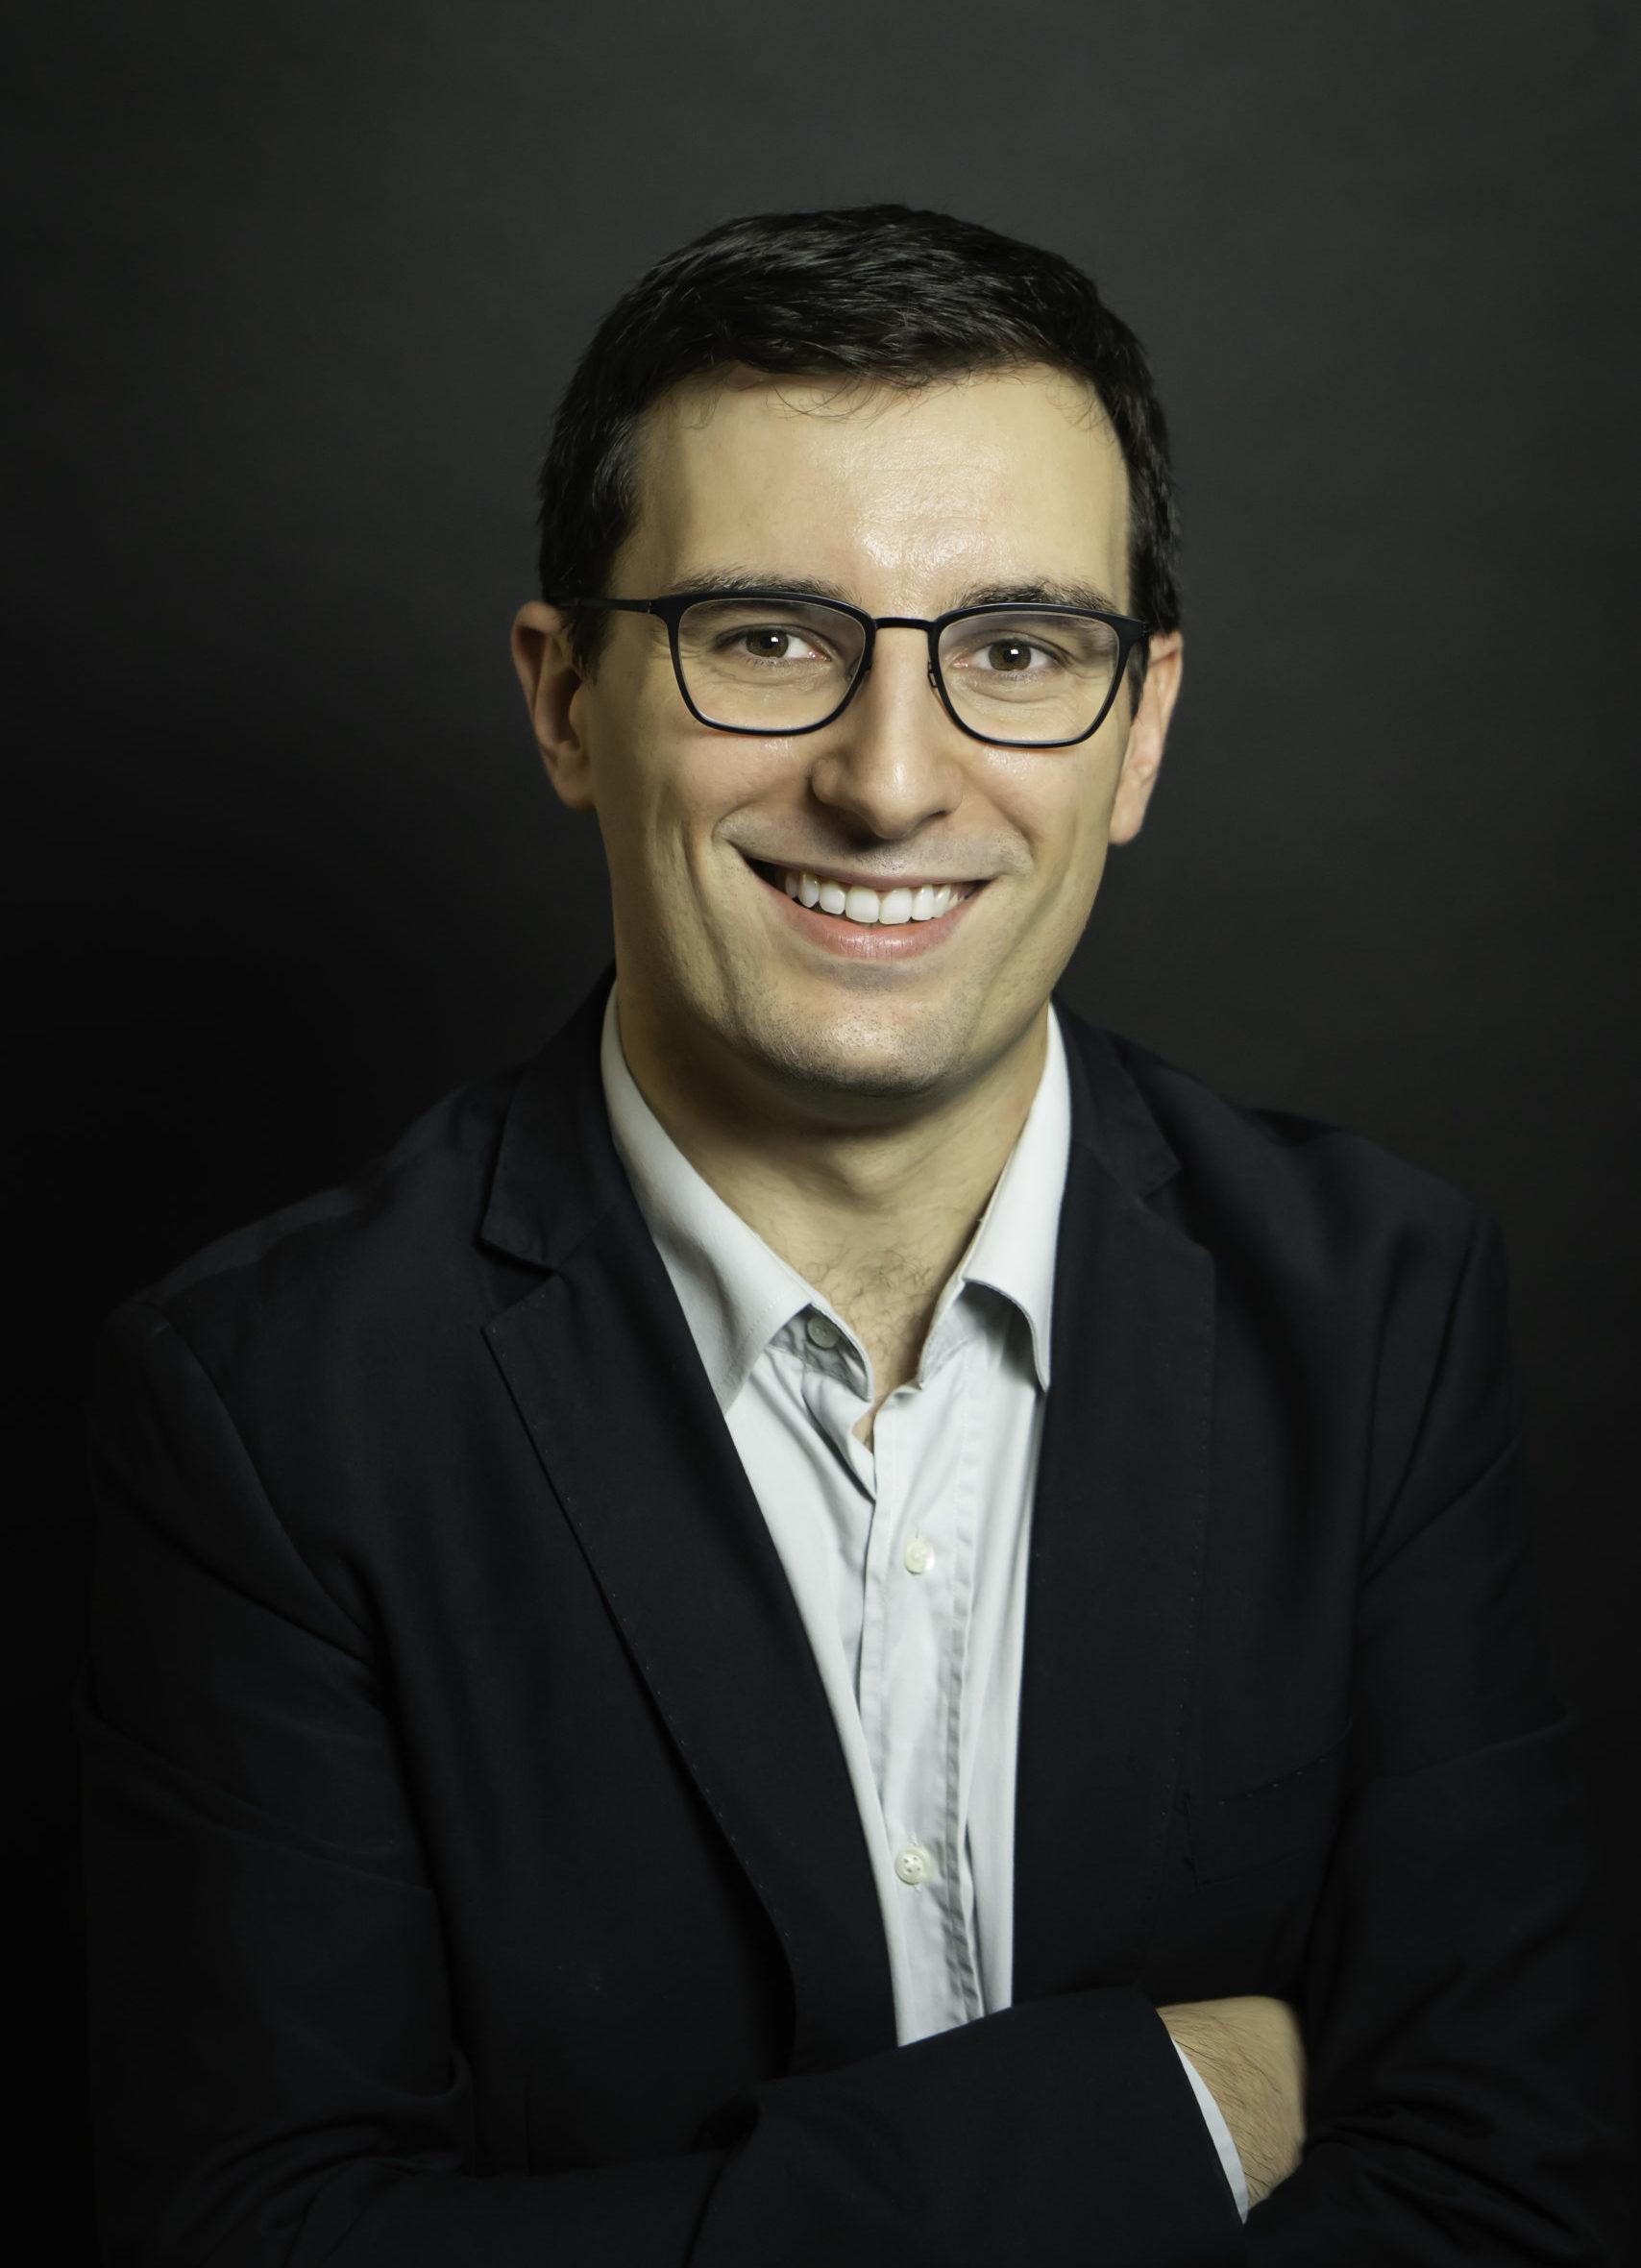 Fabio Menchetti